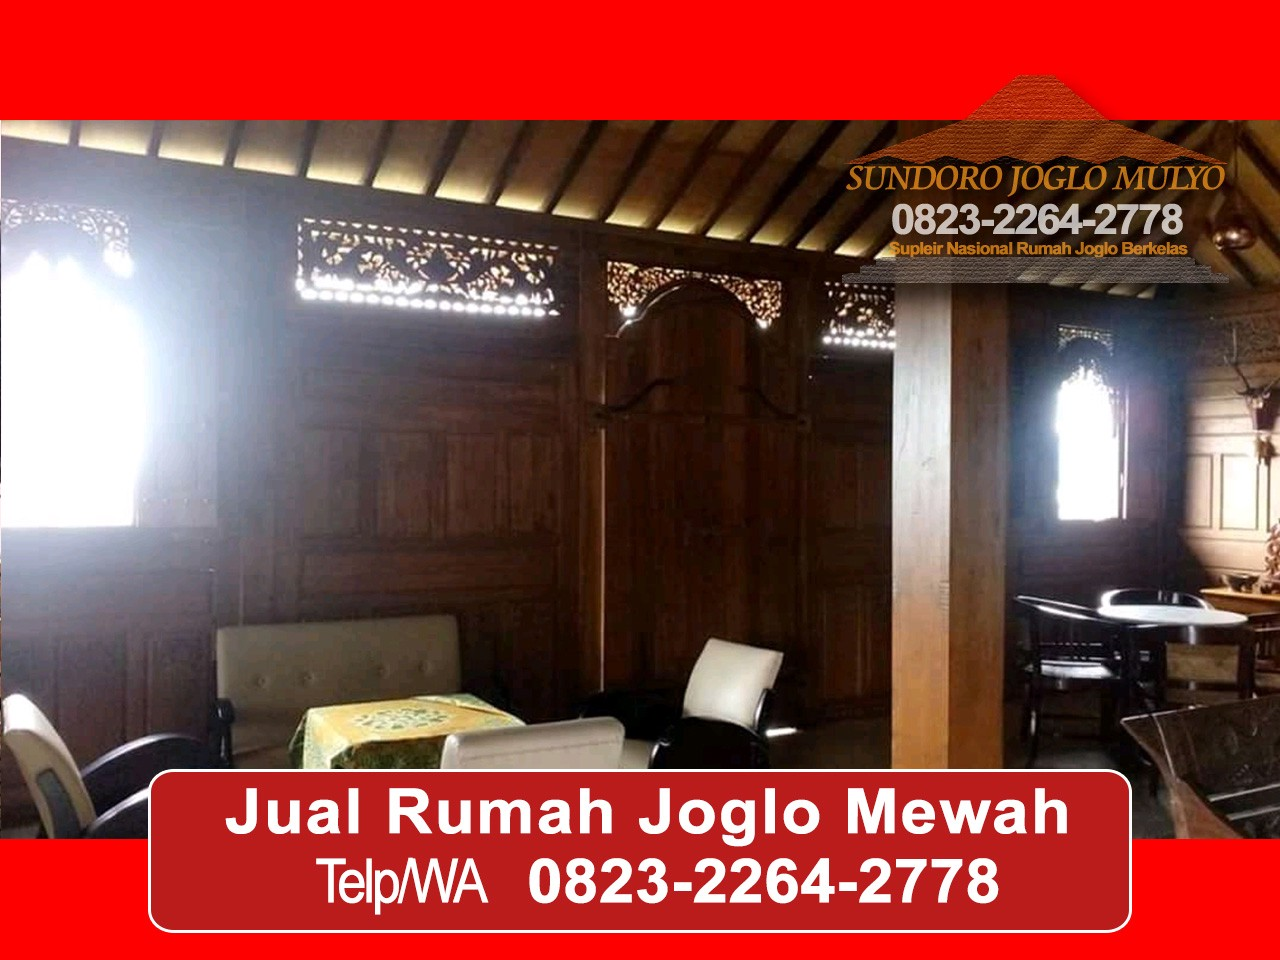 Antik 0823 2264 2778 Harga Rumah Joglo Modern Rumah Joglo Mewah